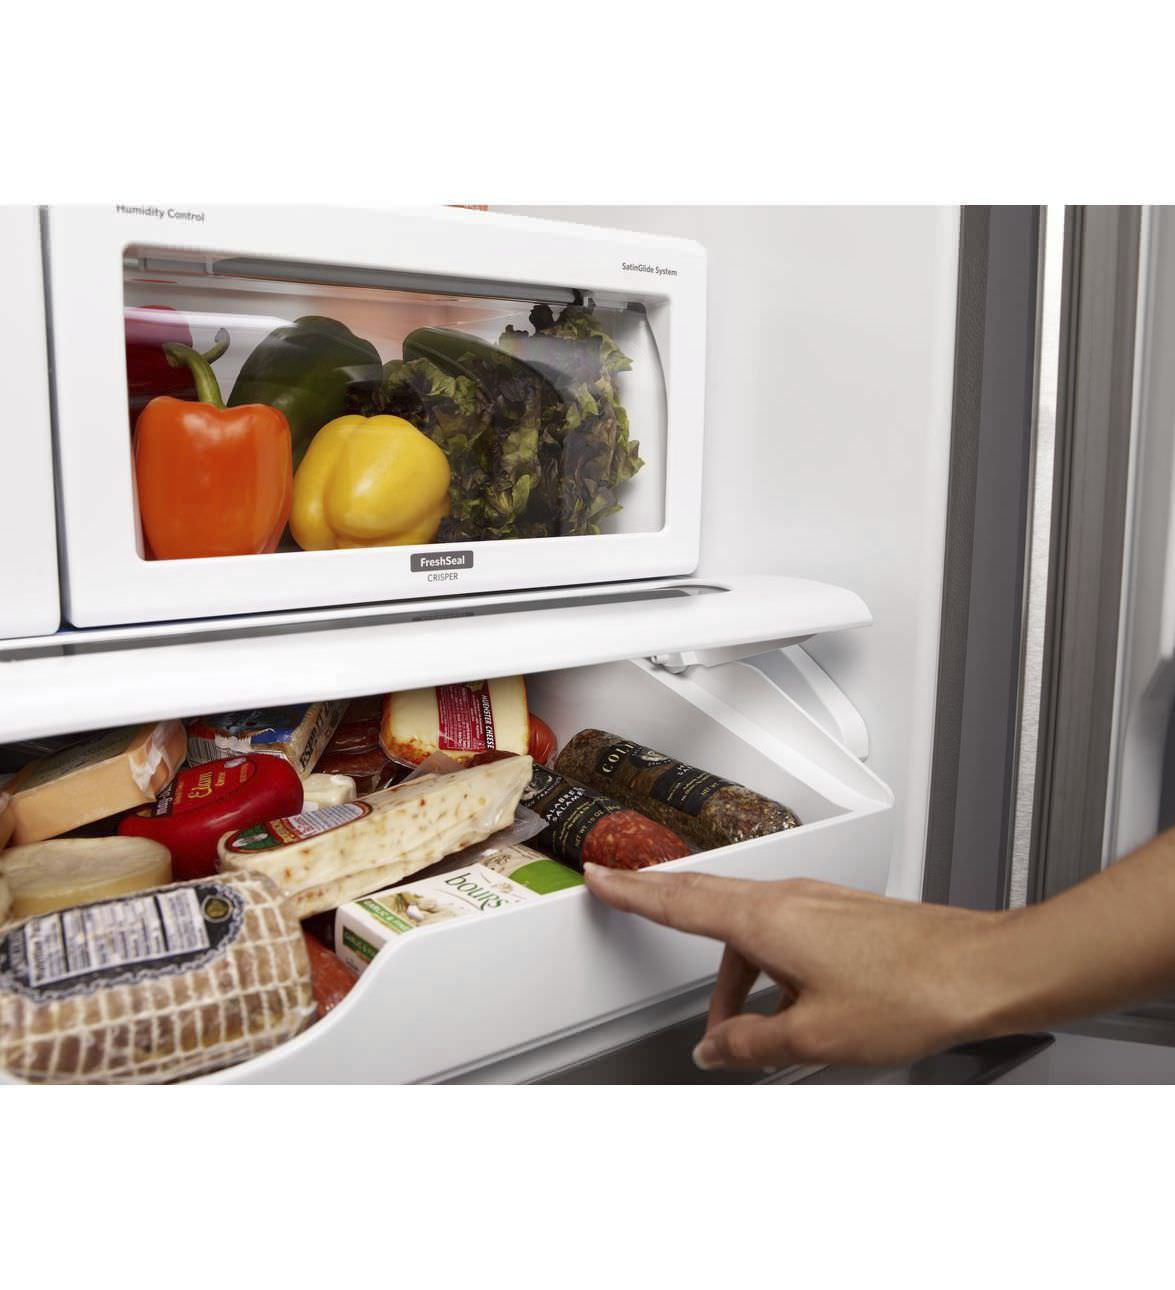 kitchenaid refrigerator kfis20xvms : Kitchen.xcyyxh.com